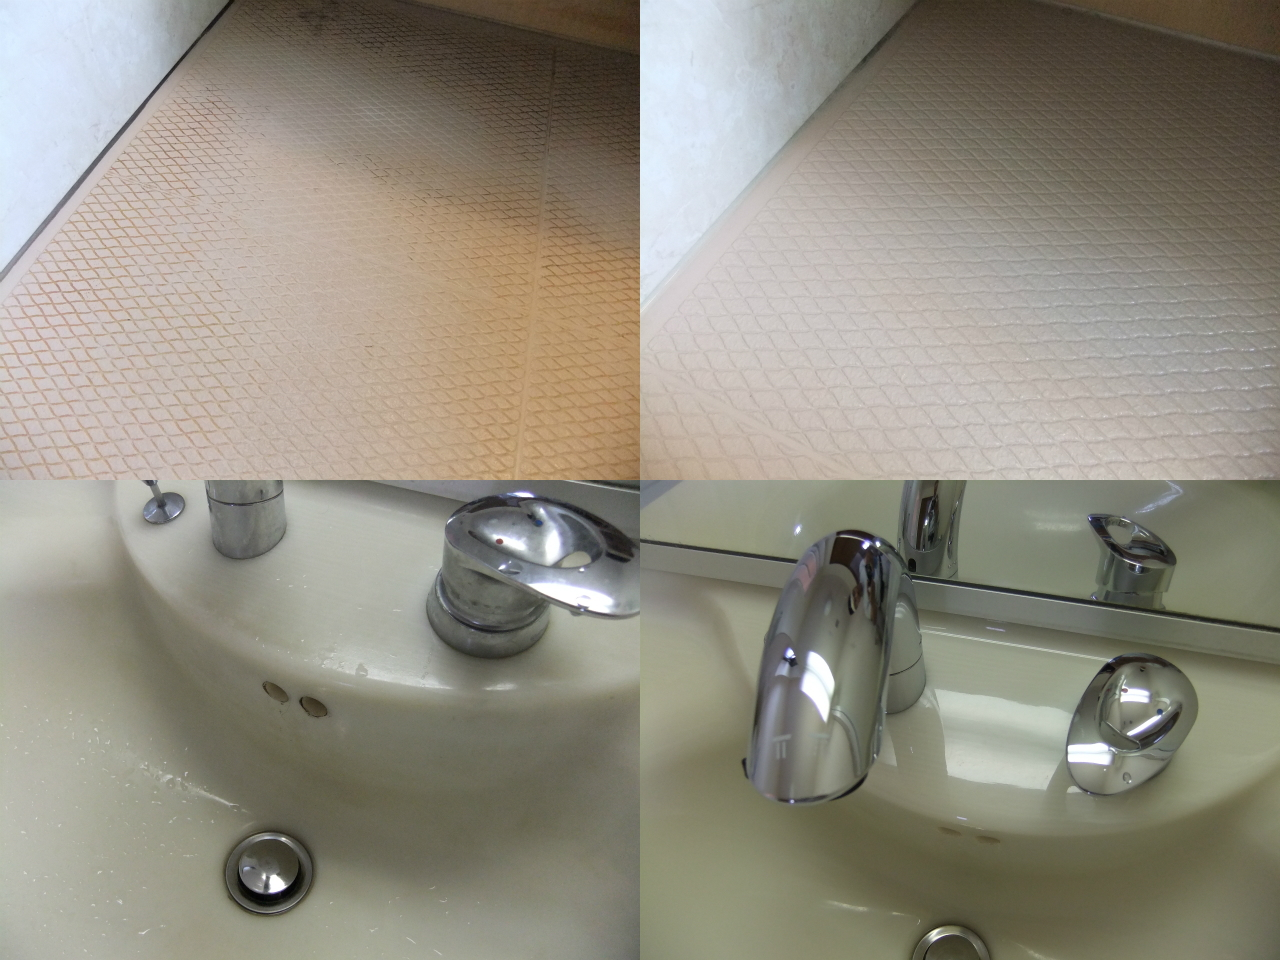 http://ajras.net/images/120524-bathroom.jpg